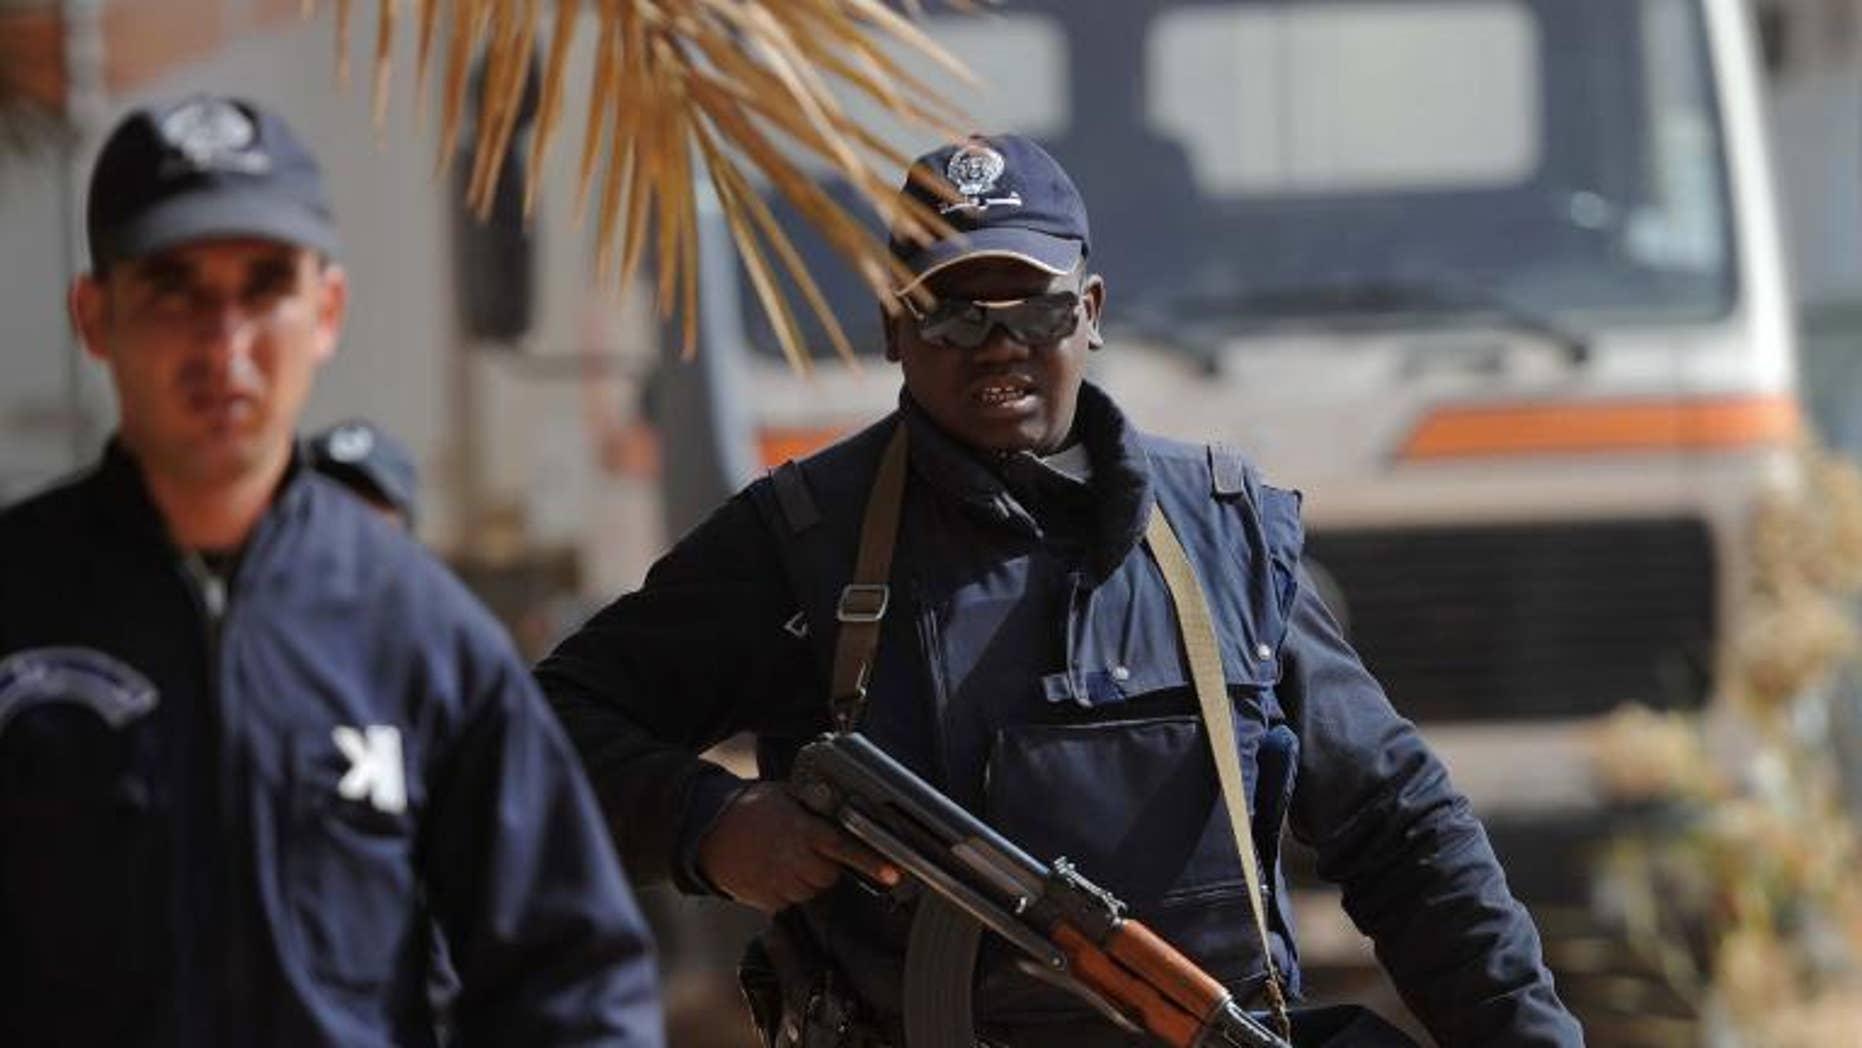 Algerian police in Amenas on January 21, 2012